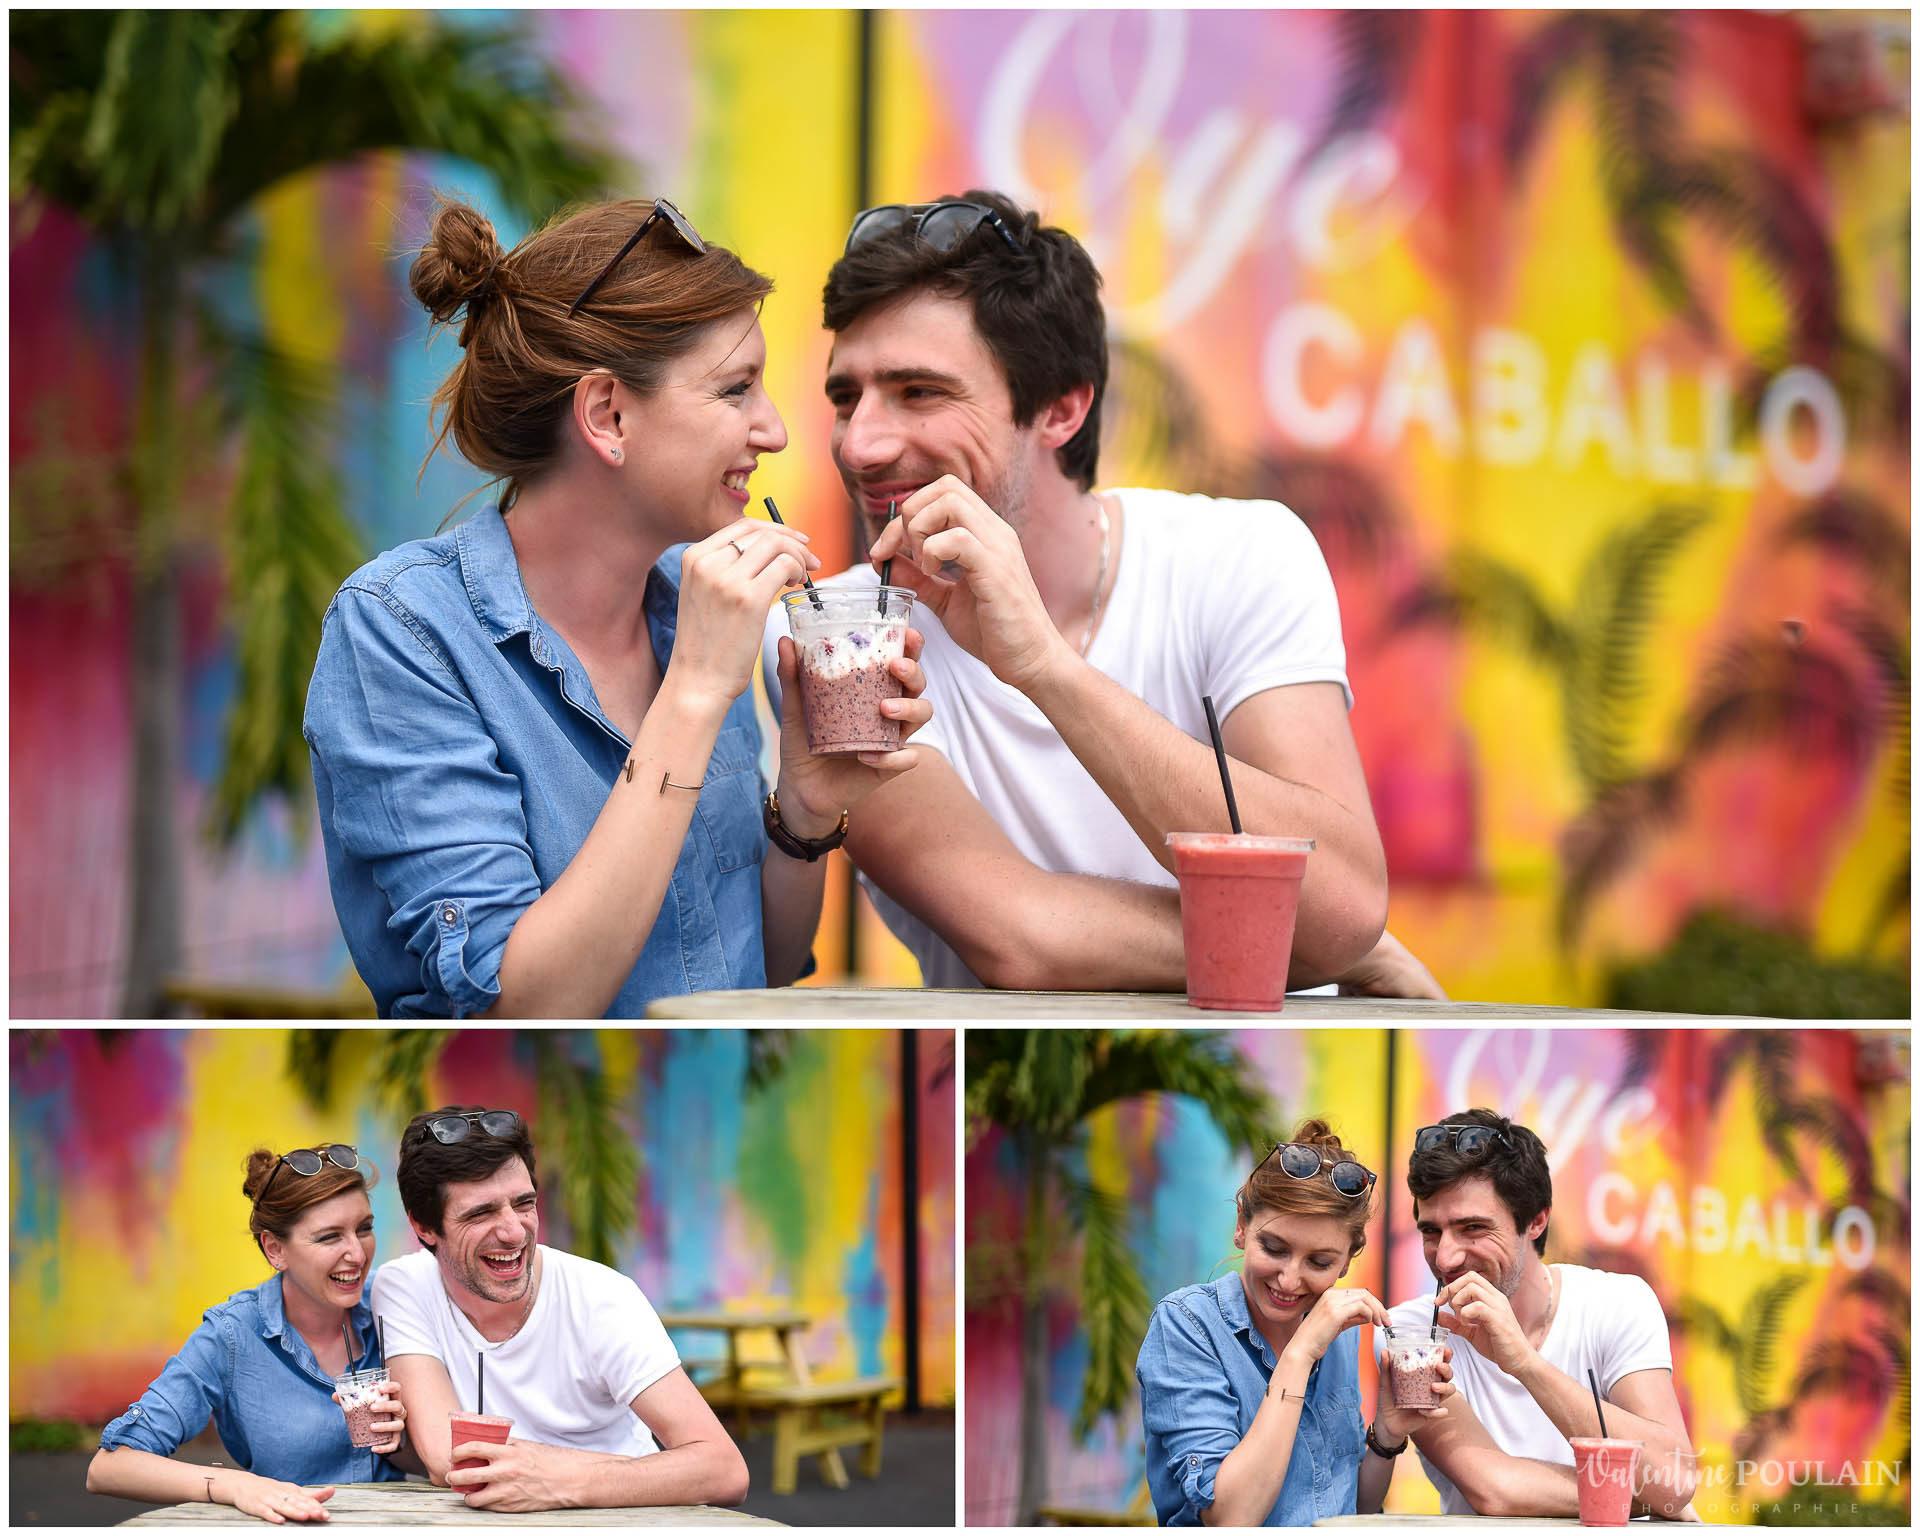 Couple Miami Wynwood - Valentine Poulain smoothie